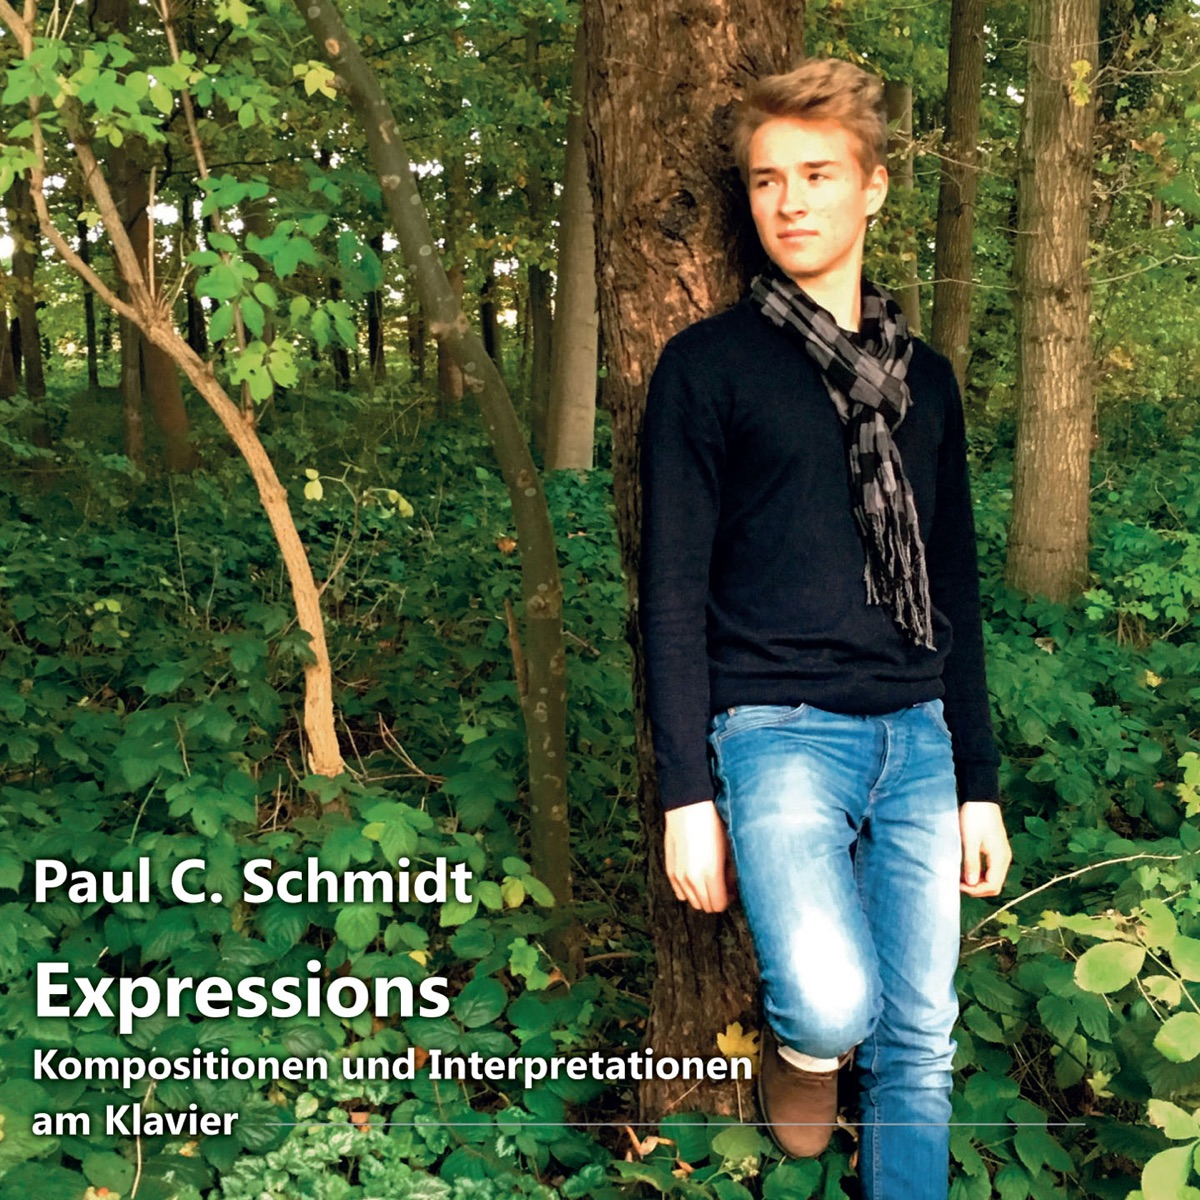 Expressions Kompositionen und Interpretationen am Klavier Paul C Schmidt CD cover